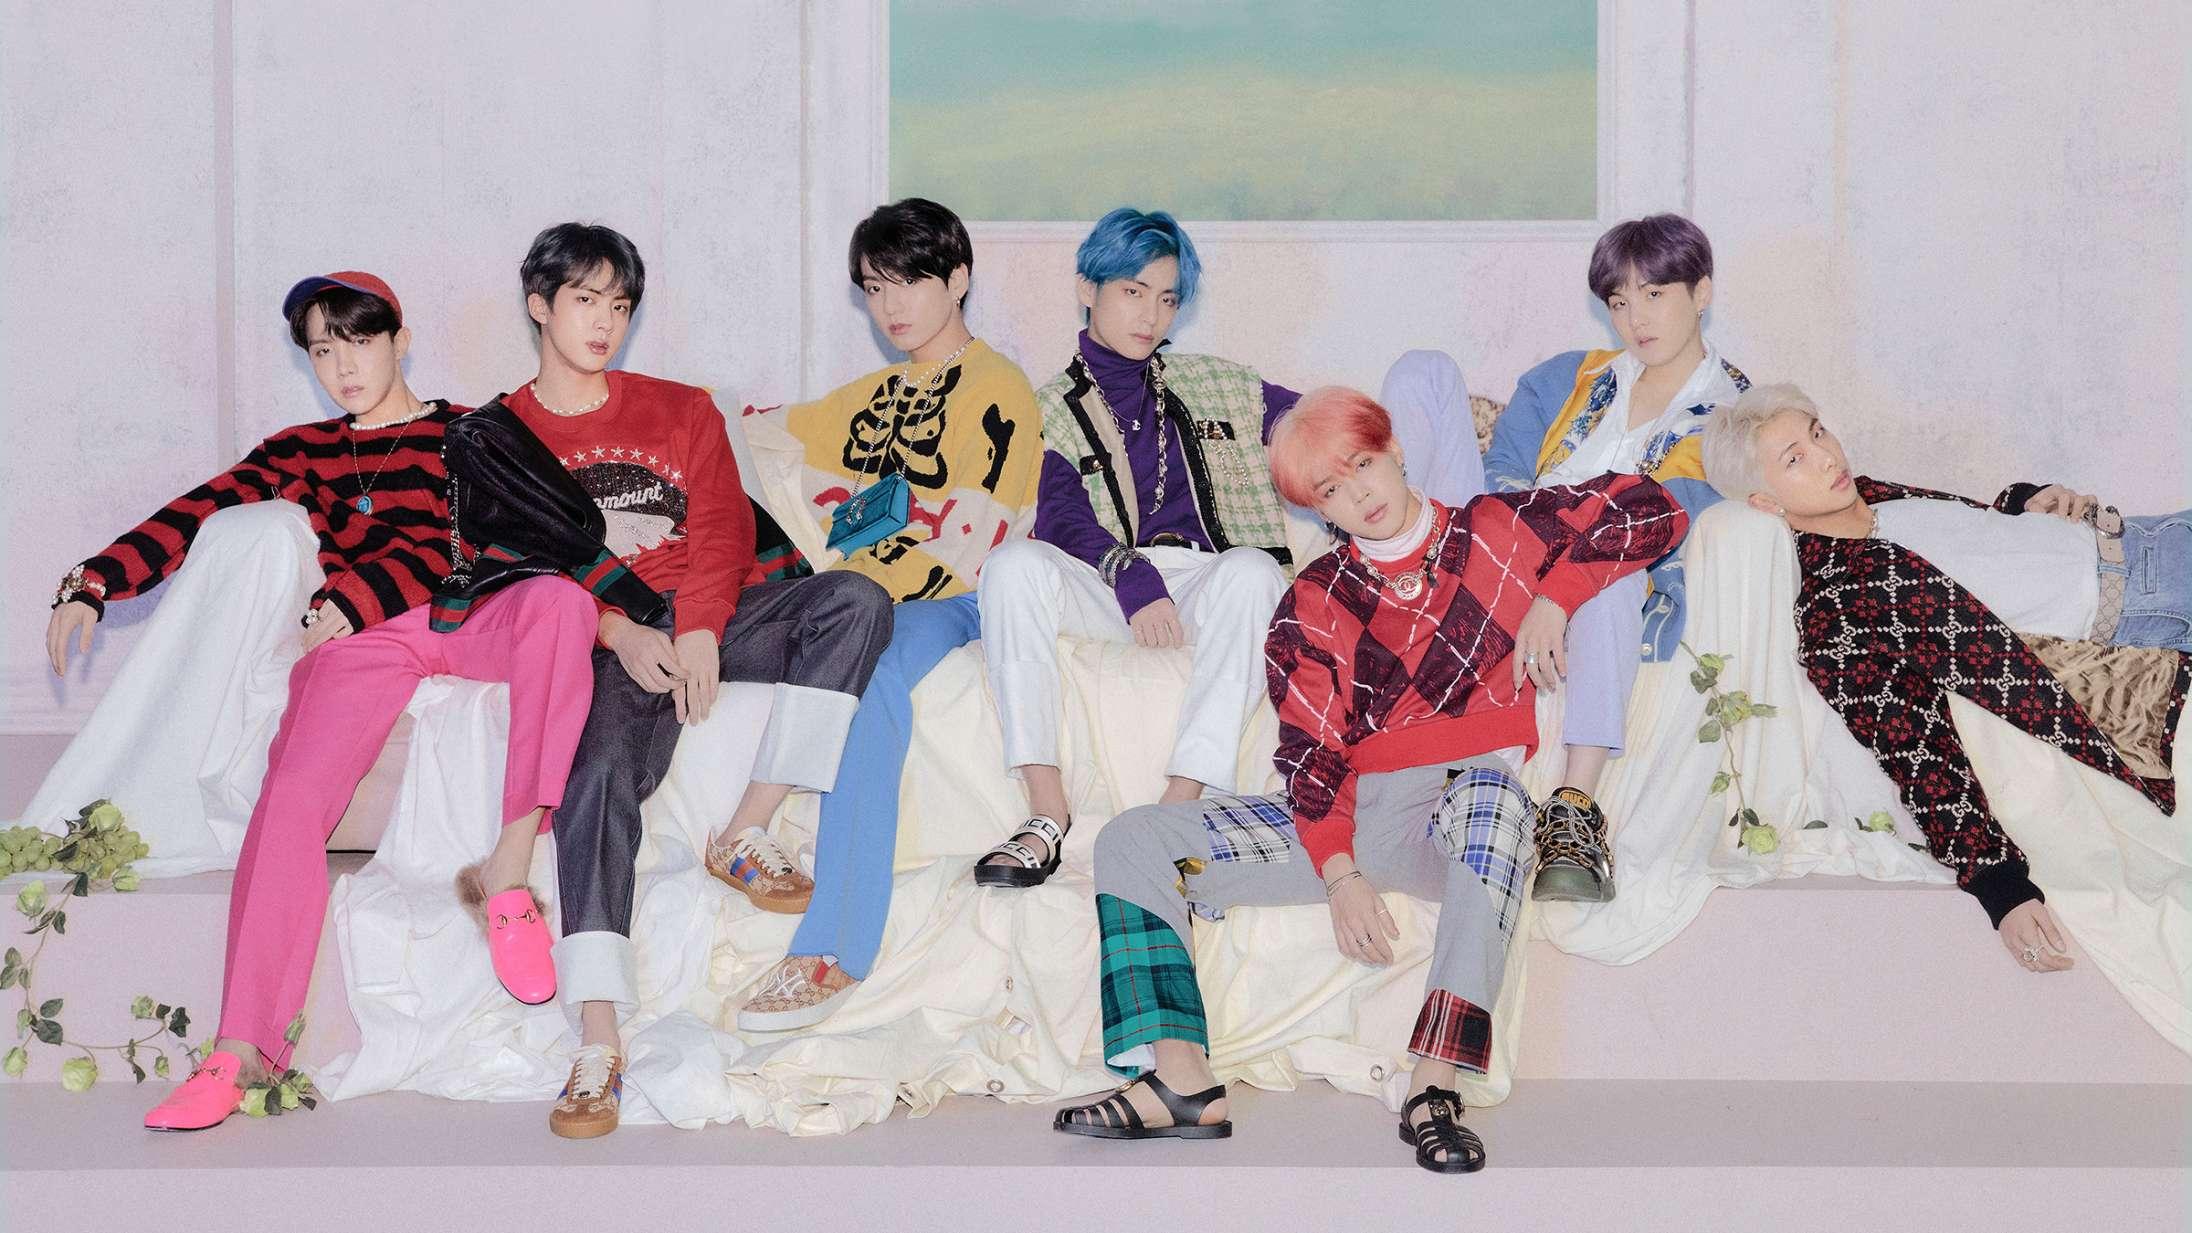 BTS synger om håb i en håbløs tid på 'BE'